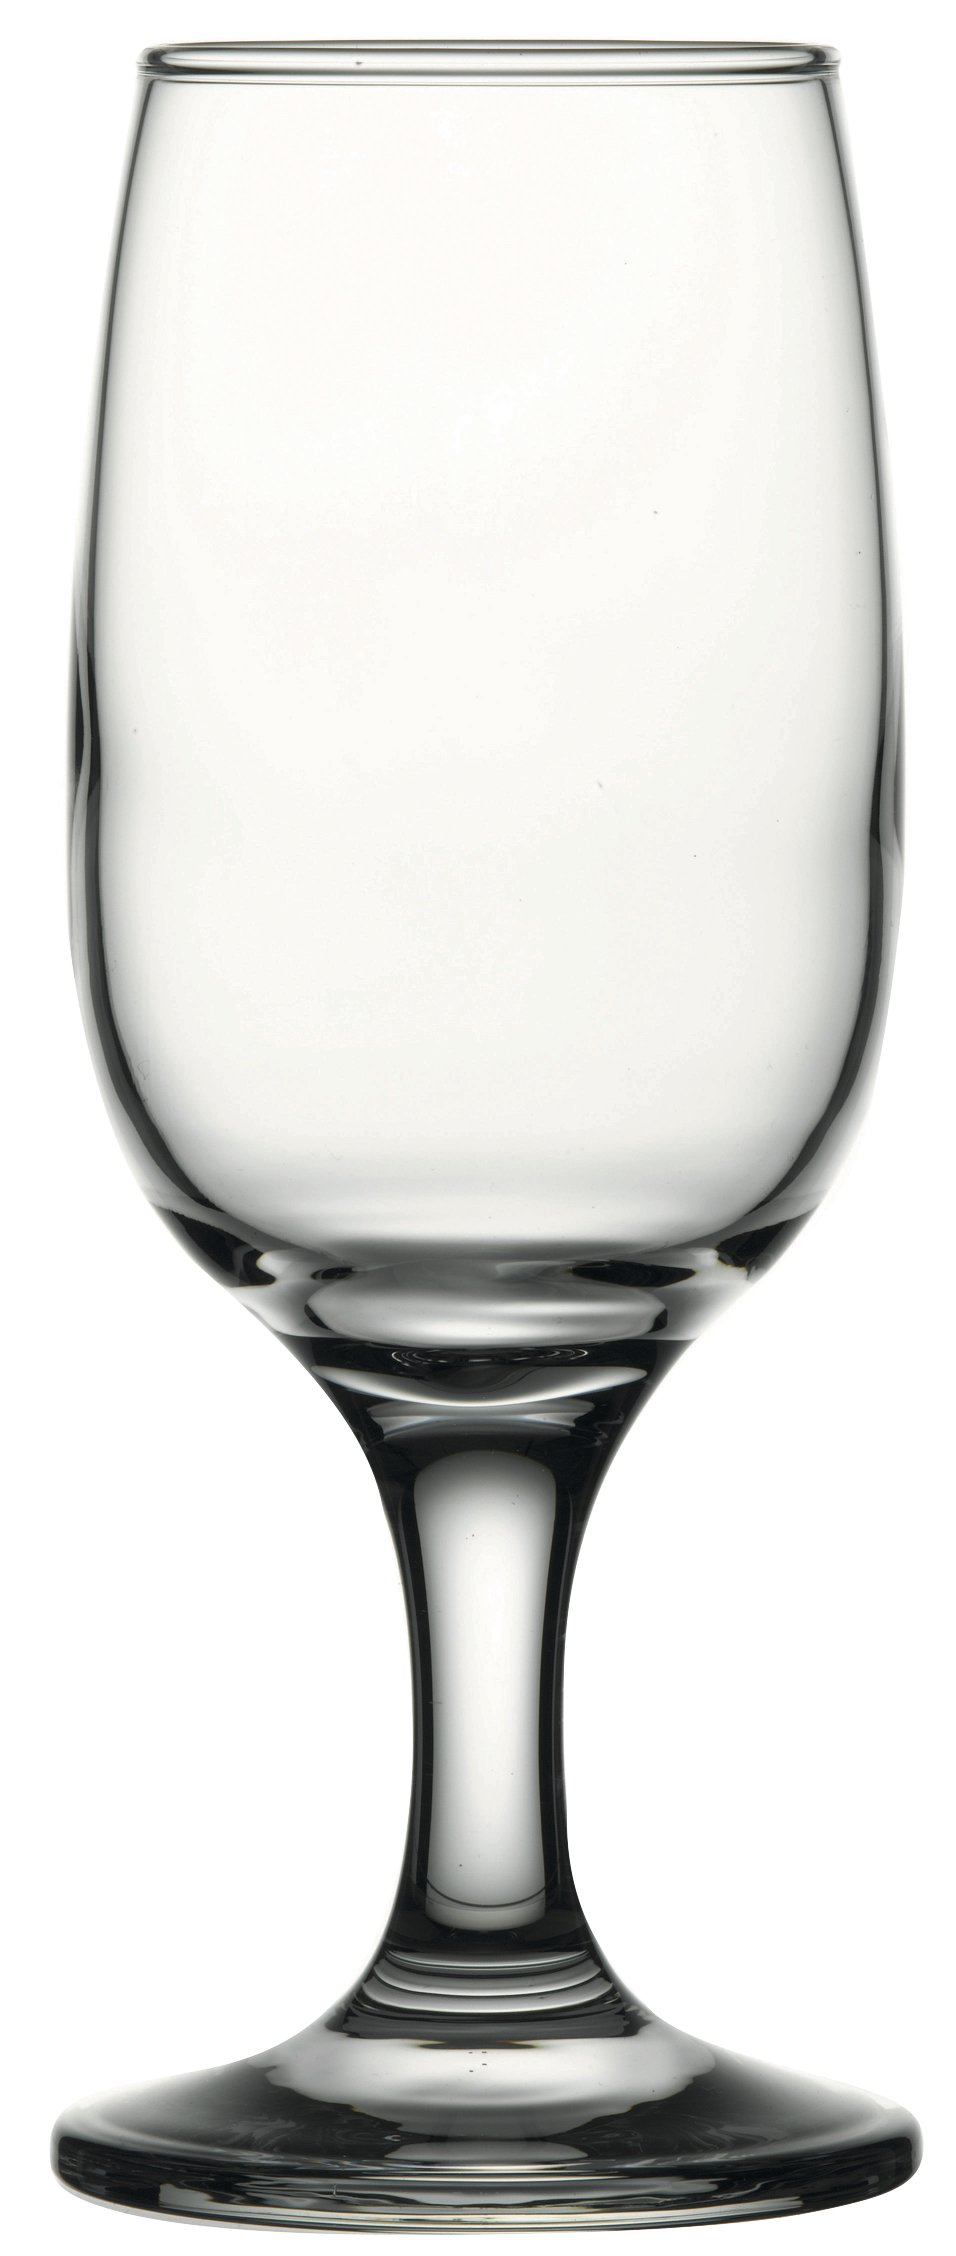 Hospitality Glass Brands 44902-024 Capri 6.5 oz. Wine (Pack of 24)